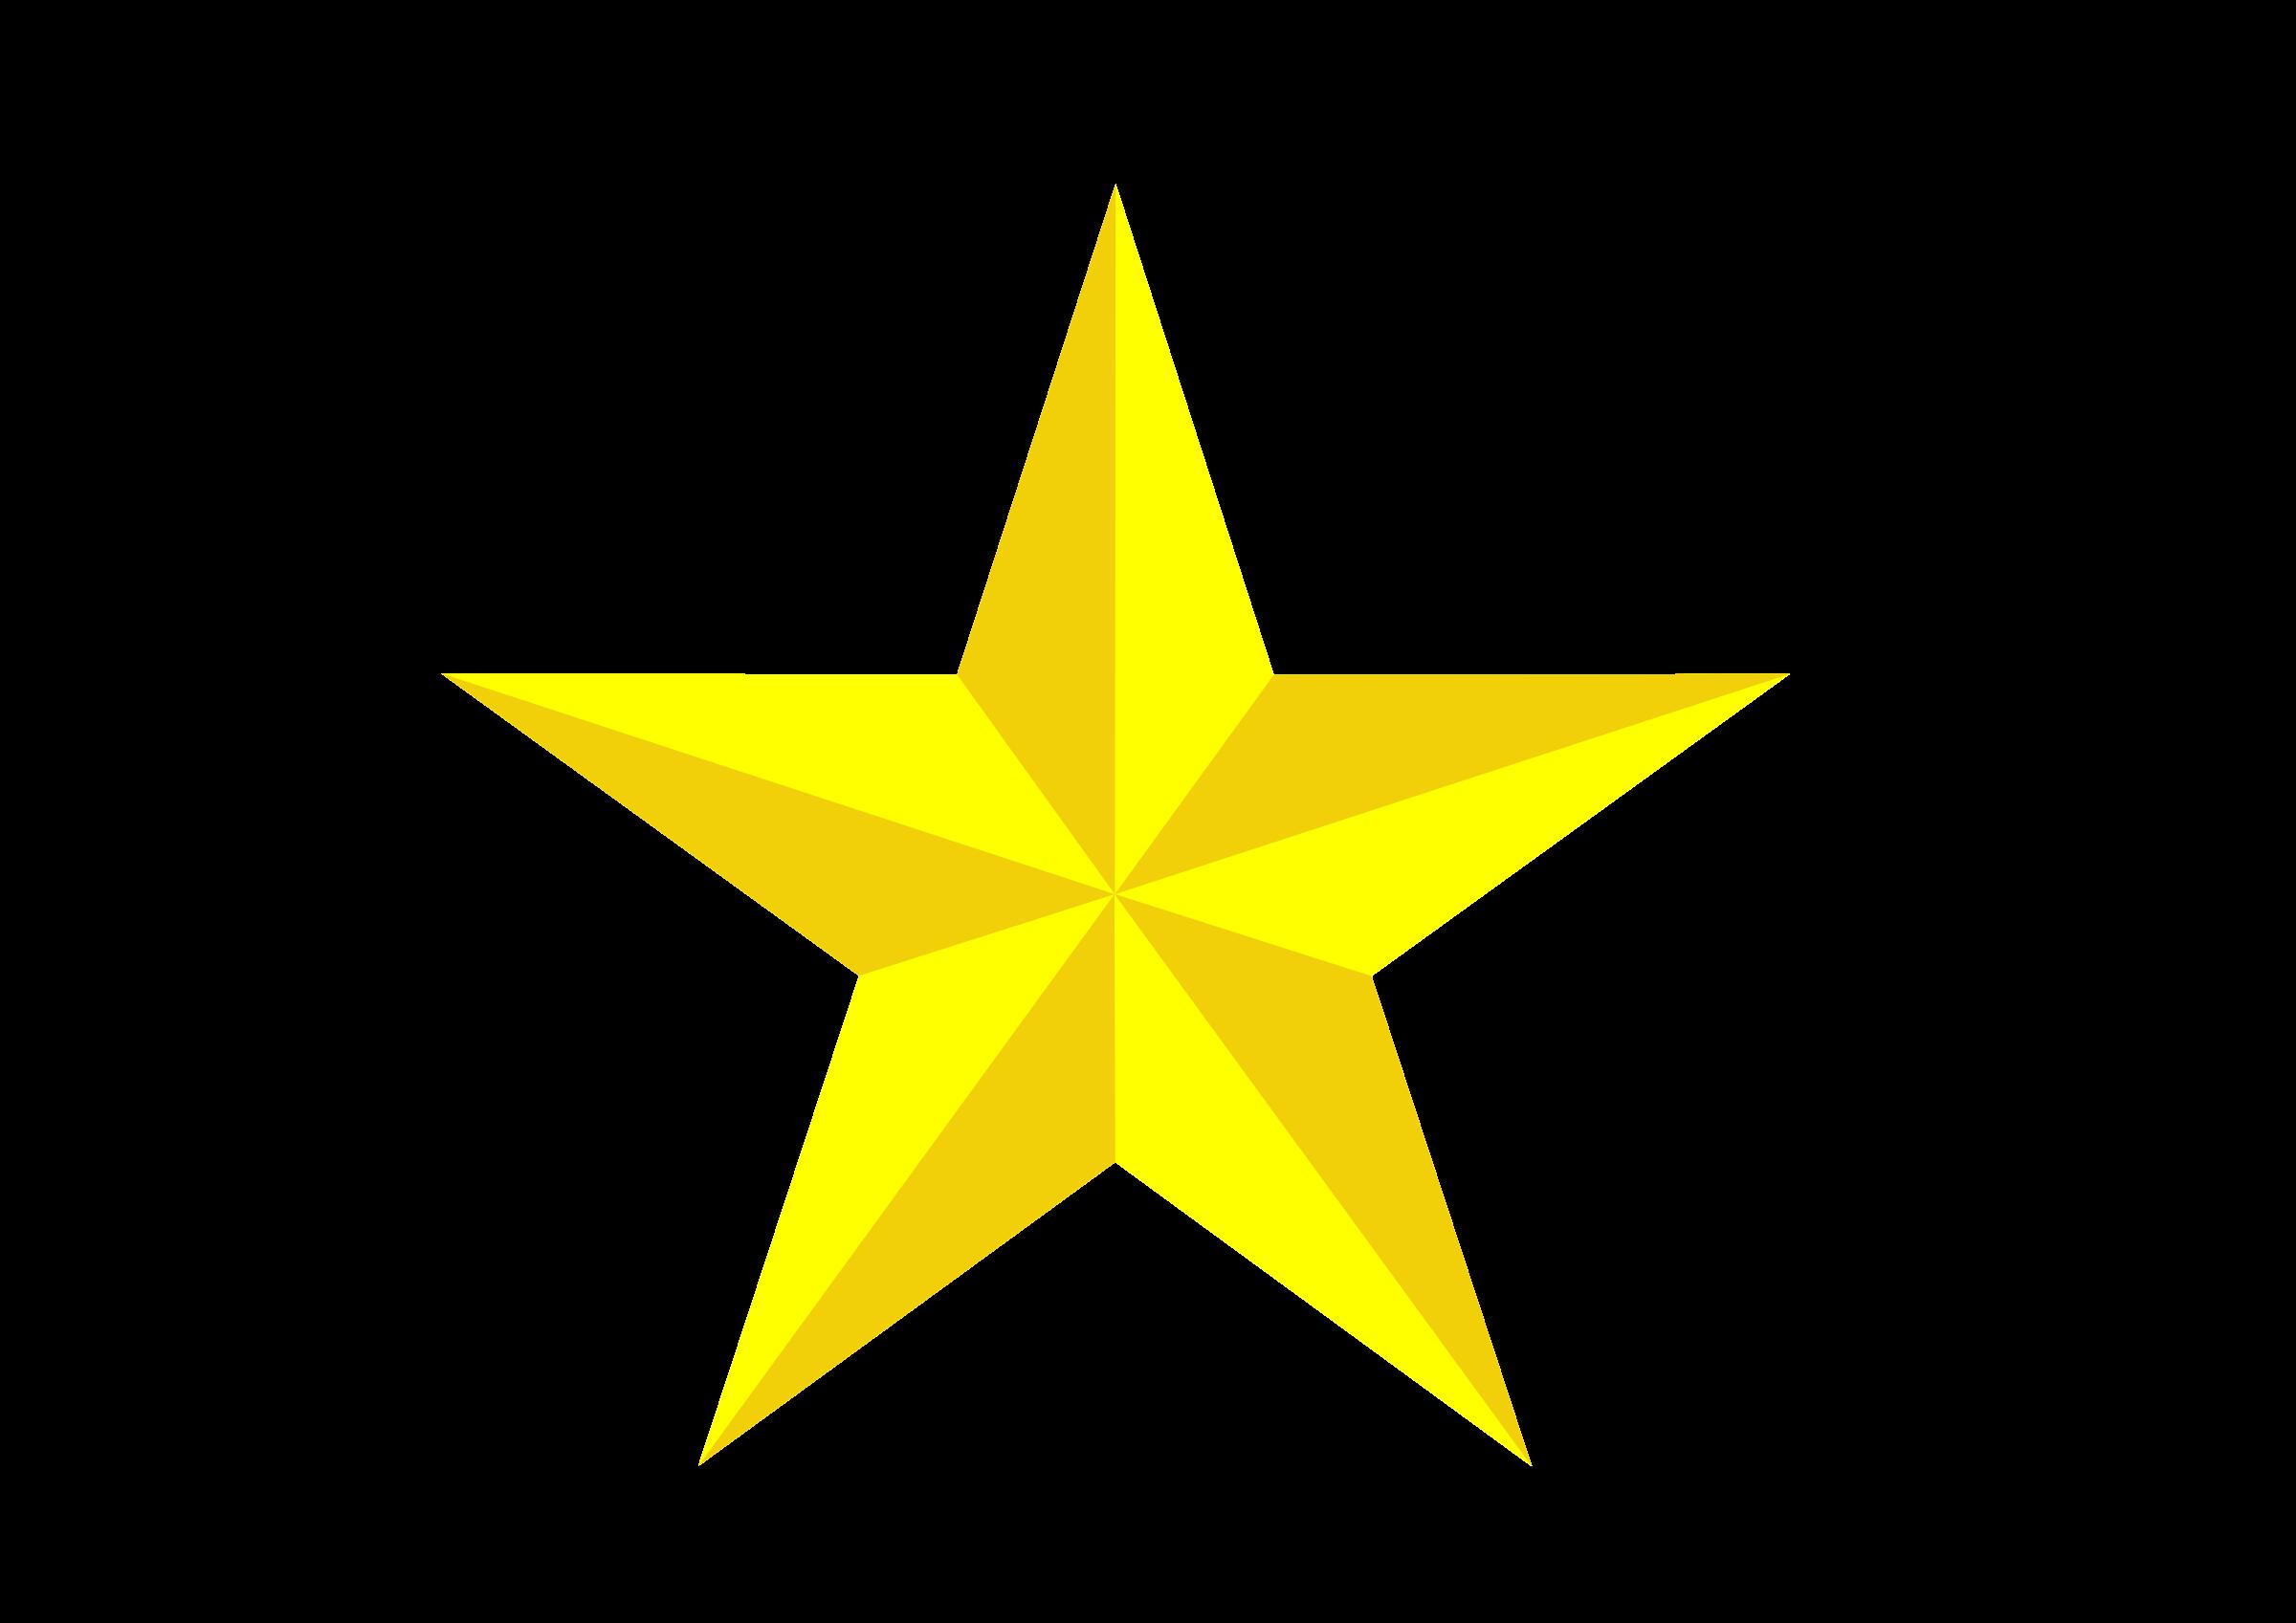 3d Spiral Star Computer Backgrounds Stars Overlays Picsart